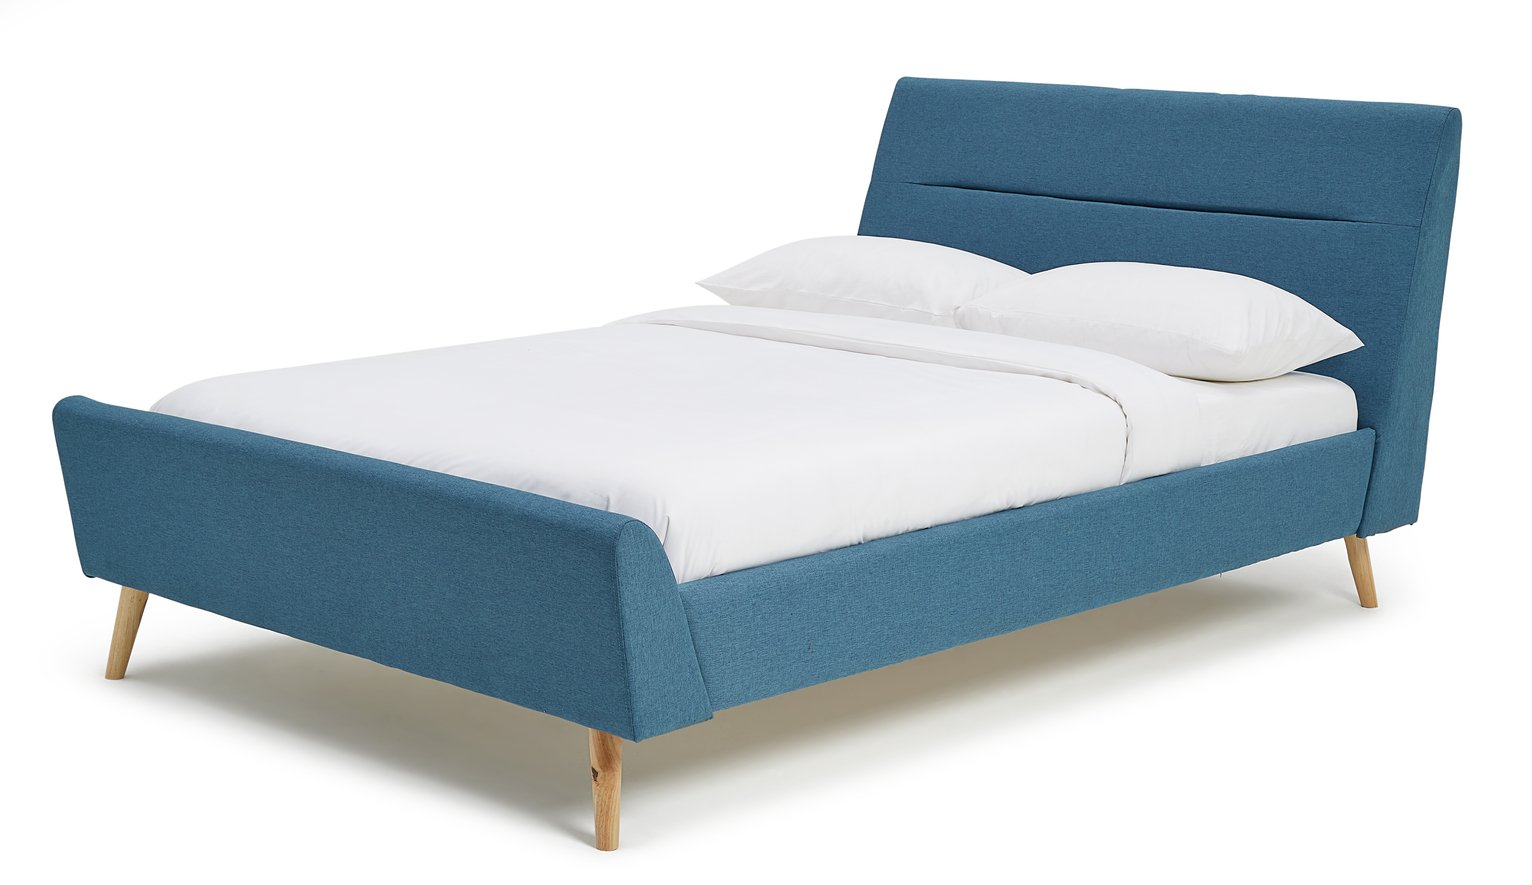 Argos Home Finn Teal Double Bed Frame